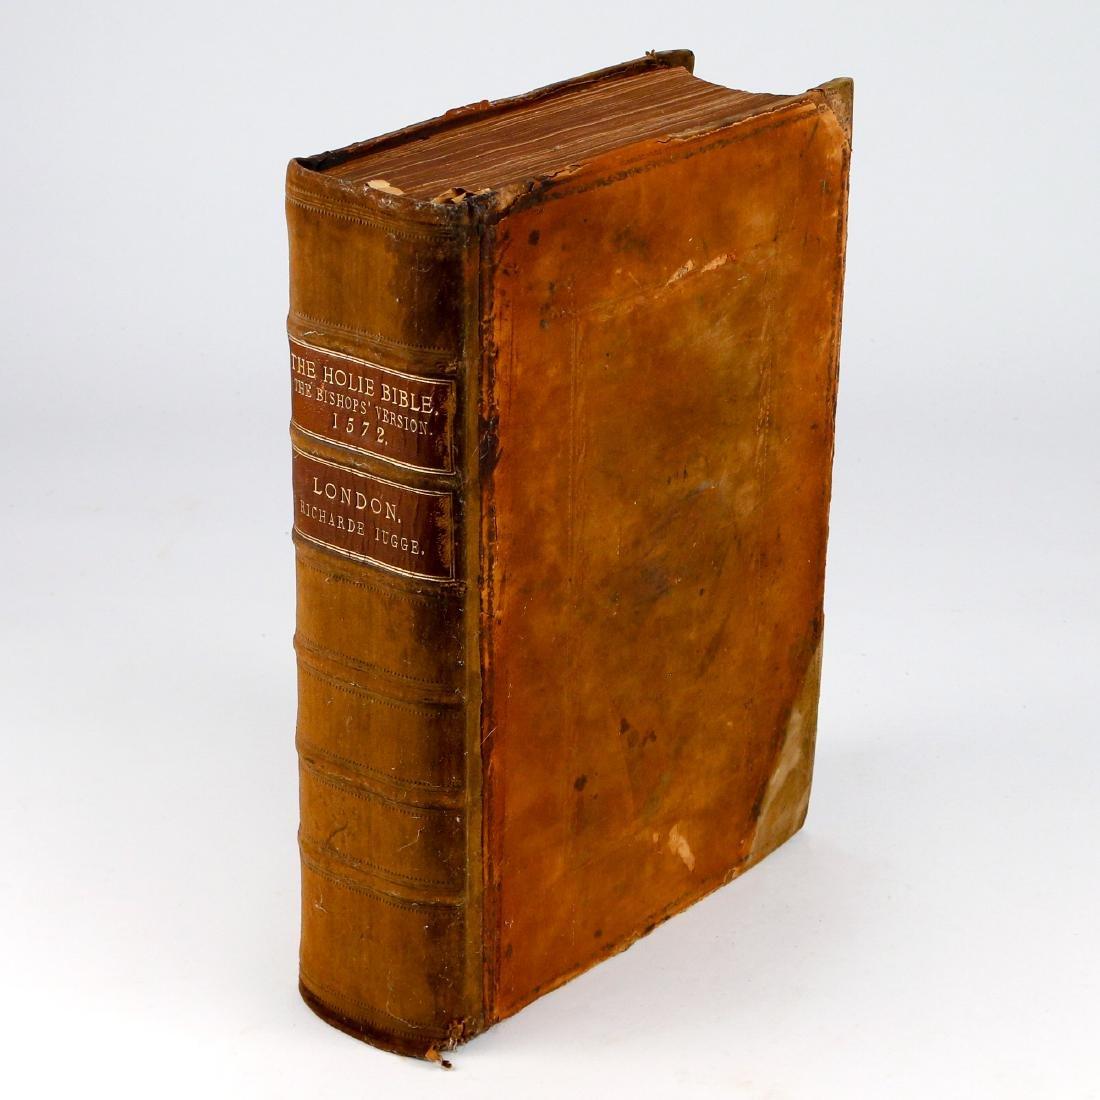 [FRANCIS FRY COPY] BISHOPS' BIBLE [1572] - 13